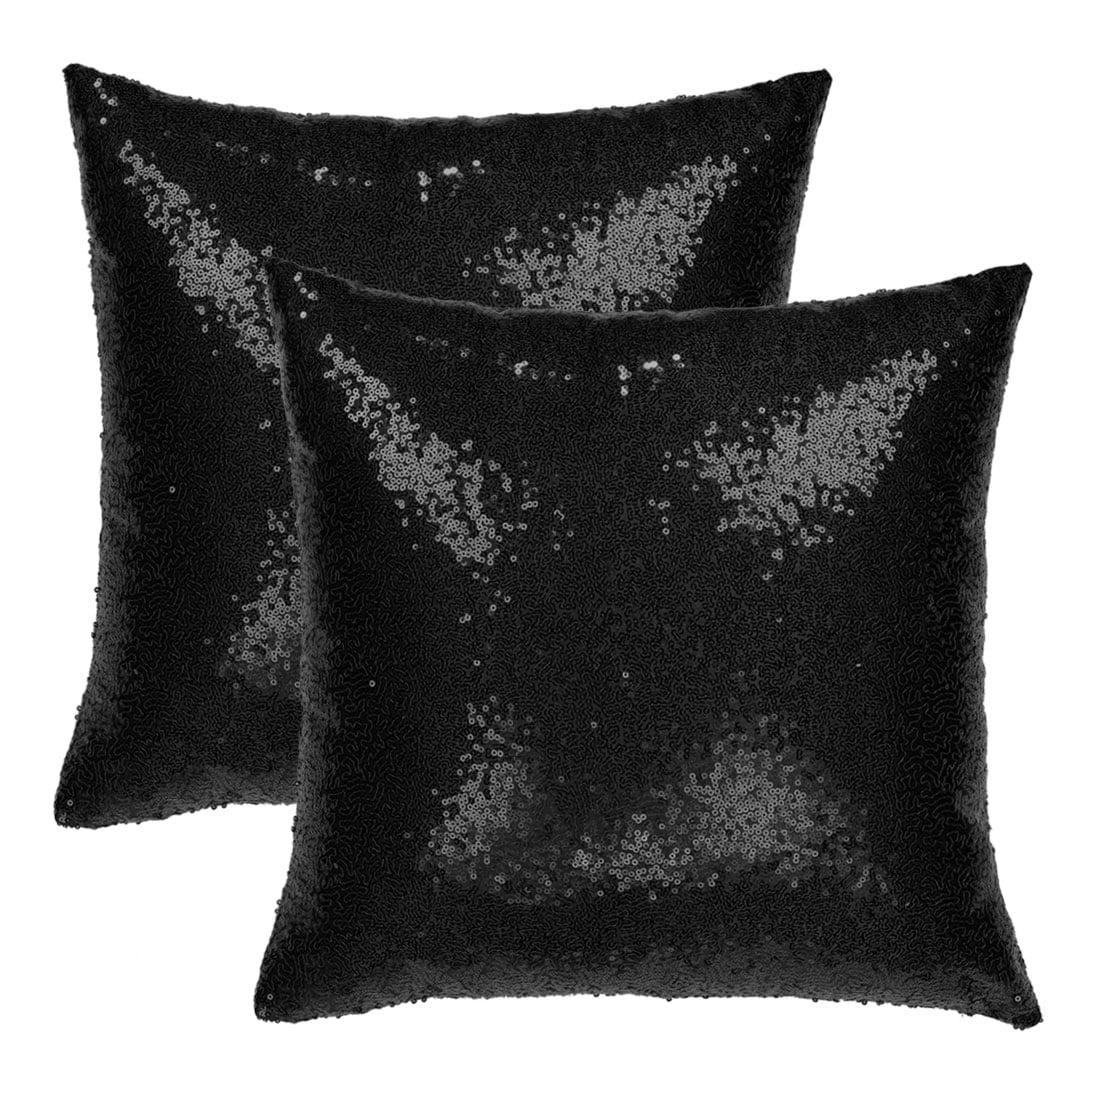 Decorative Square Shiny Sparkling Comfy Sequin Throw Pillow Cover Sofa Couch